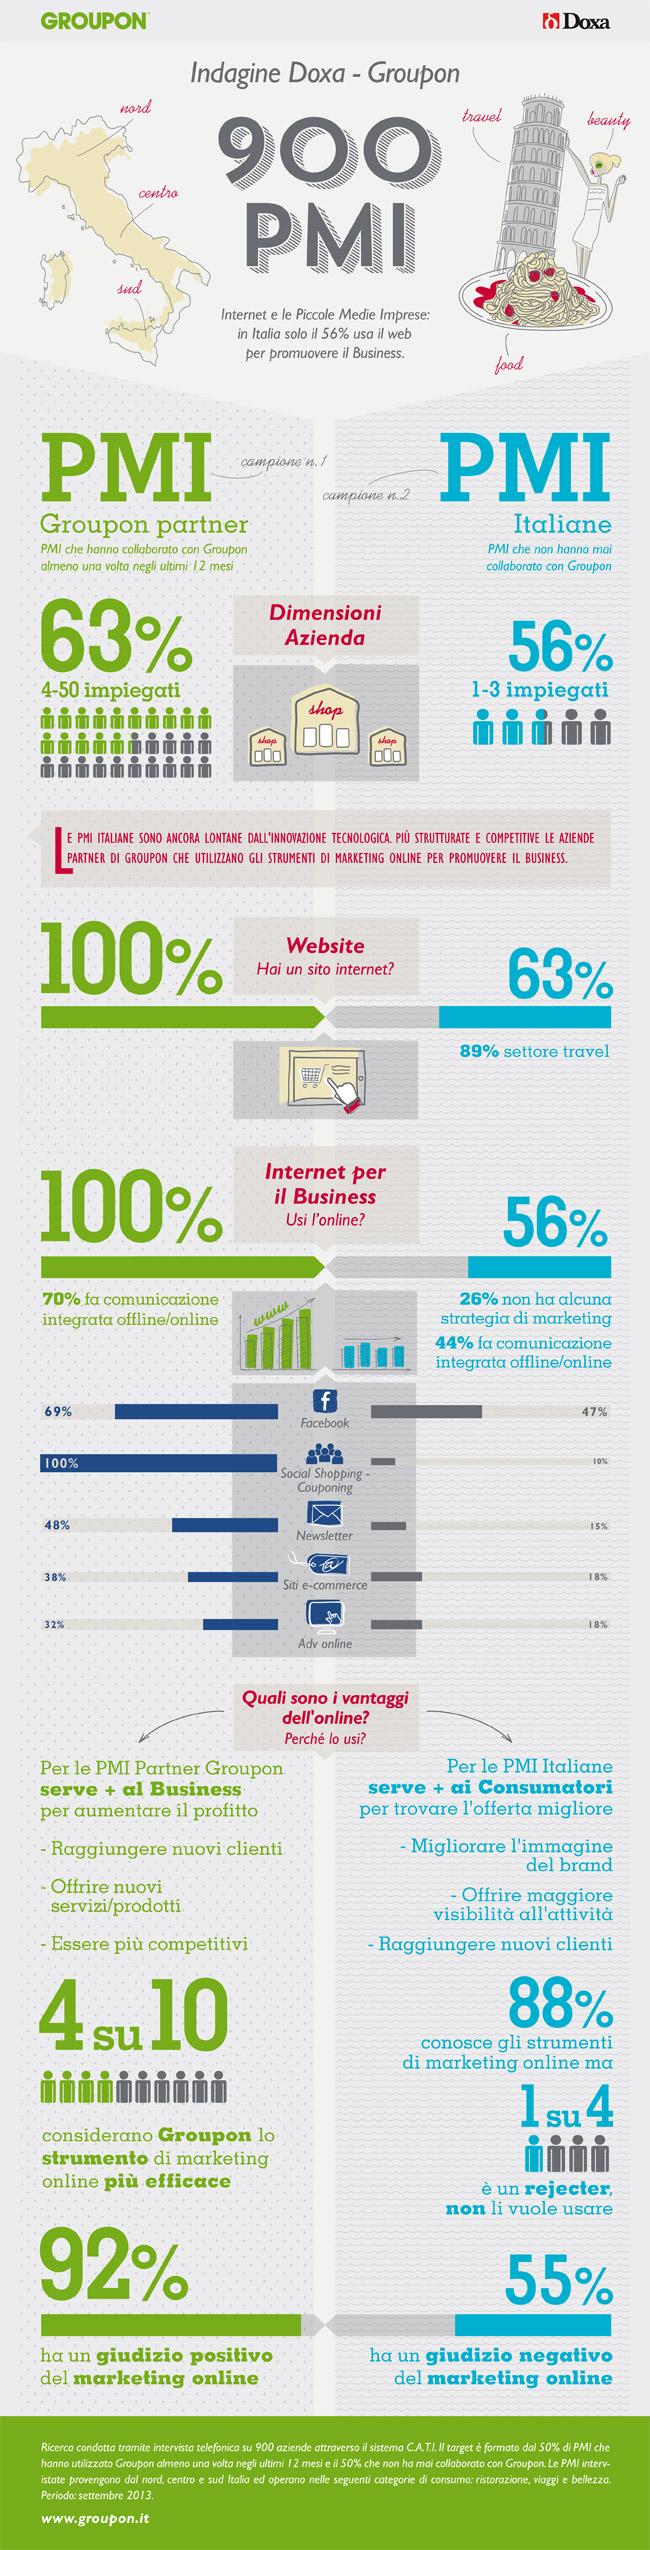 PMI-web-indagine-doxa-groupon-infografica